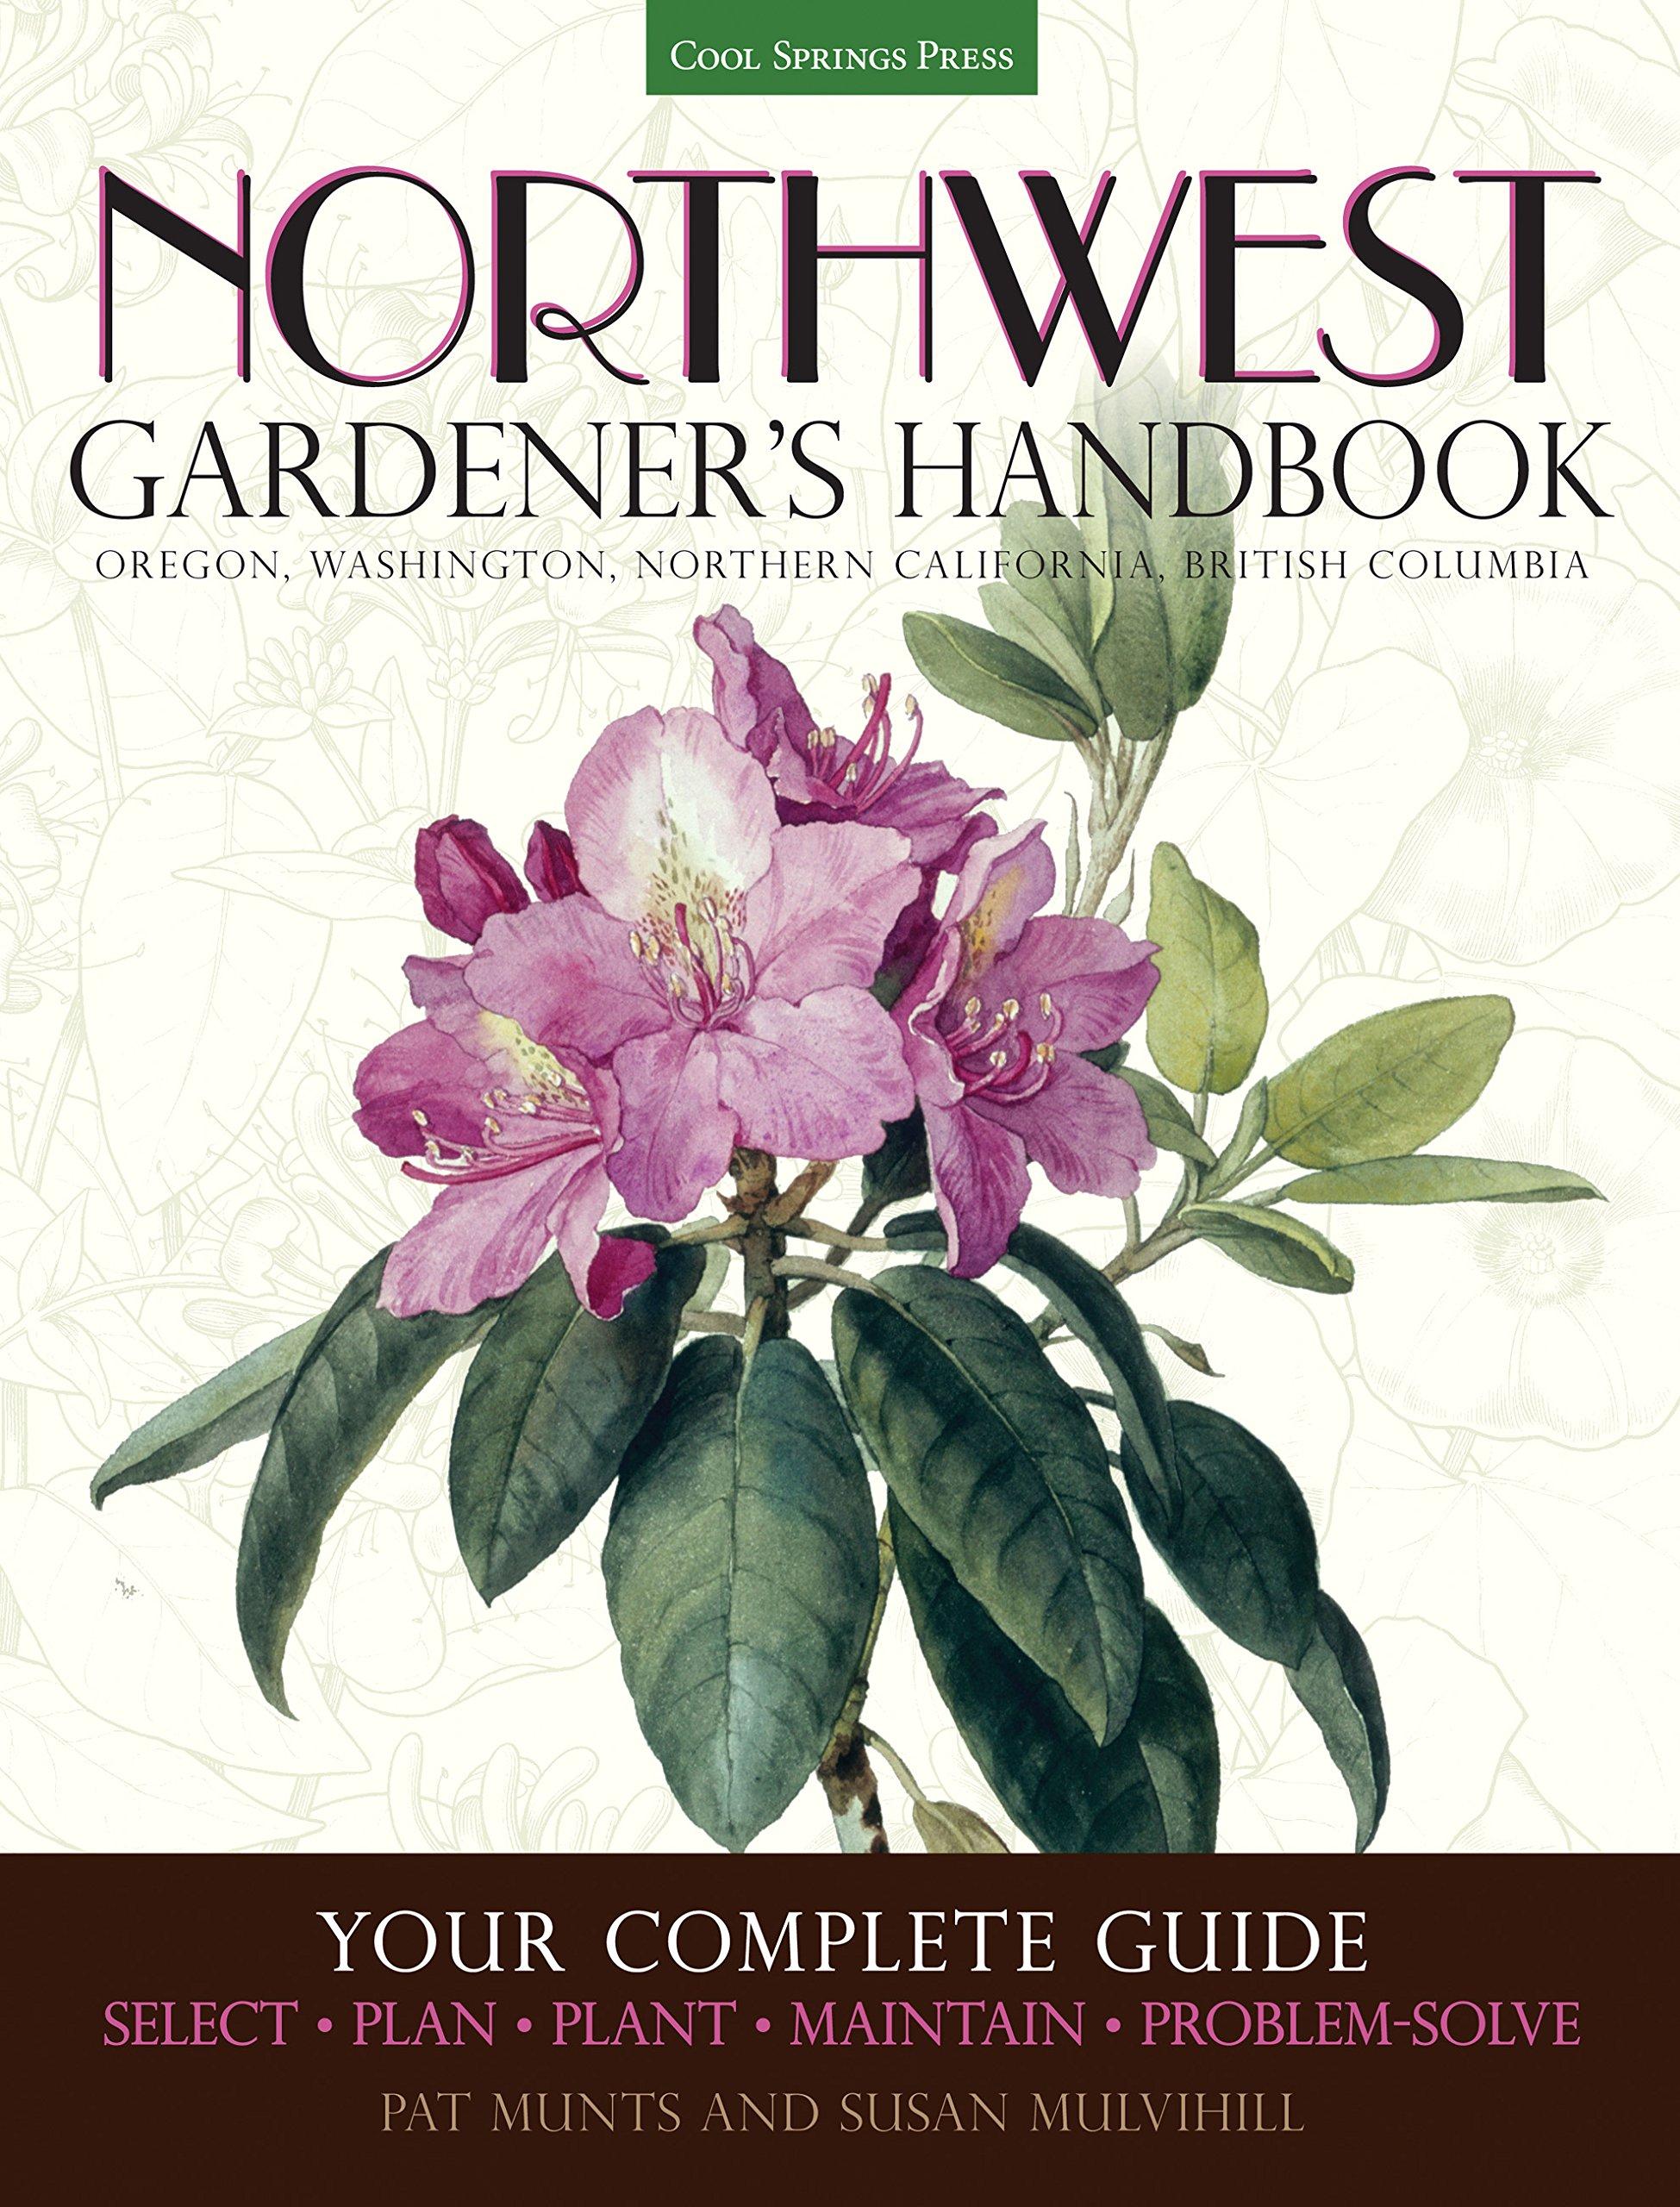 Northwest Gardener's Handbook: Your Complete Guide: Select, Plan, Plant, Maintain, Problem-Solve - Oregon, Washington, Northern California, British Columbia